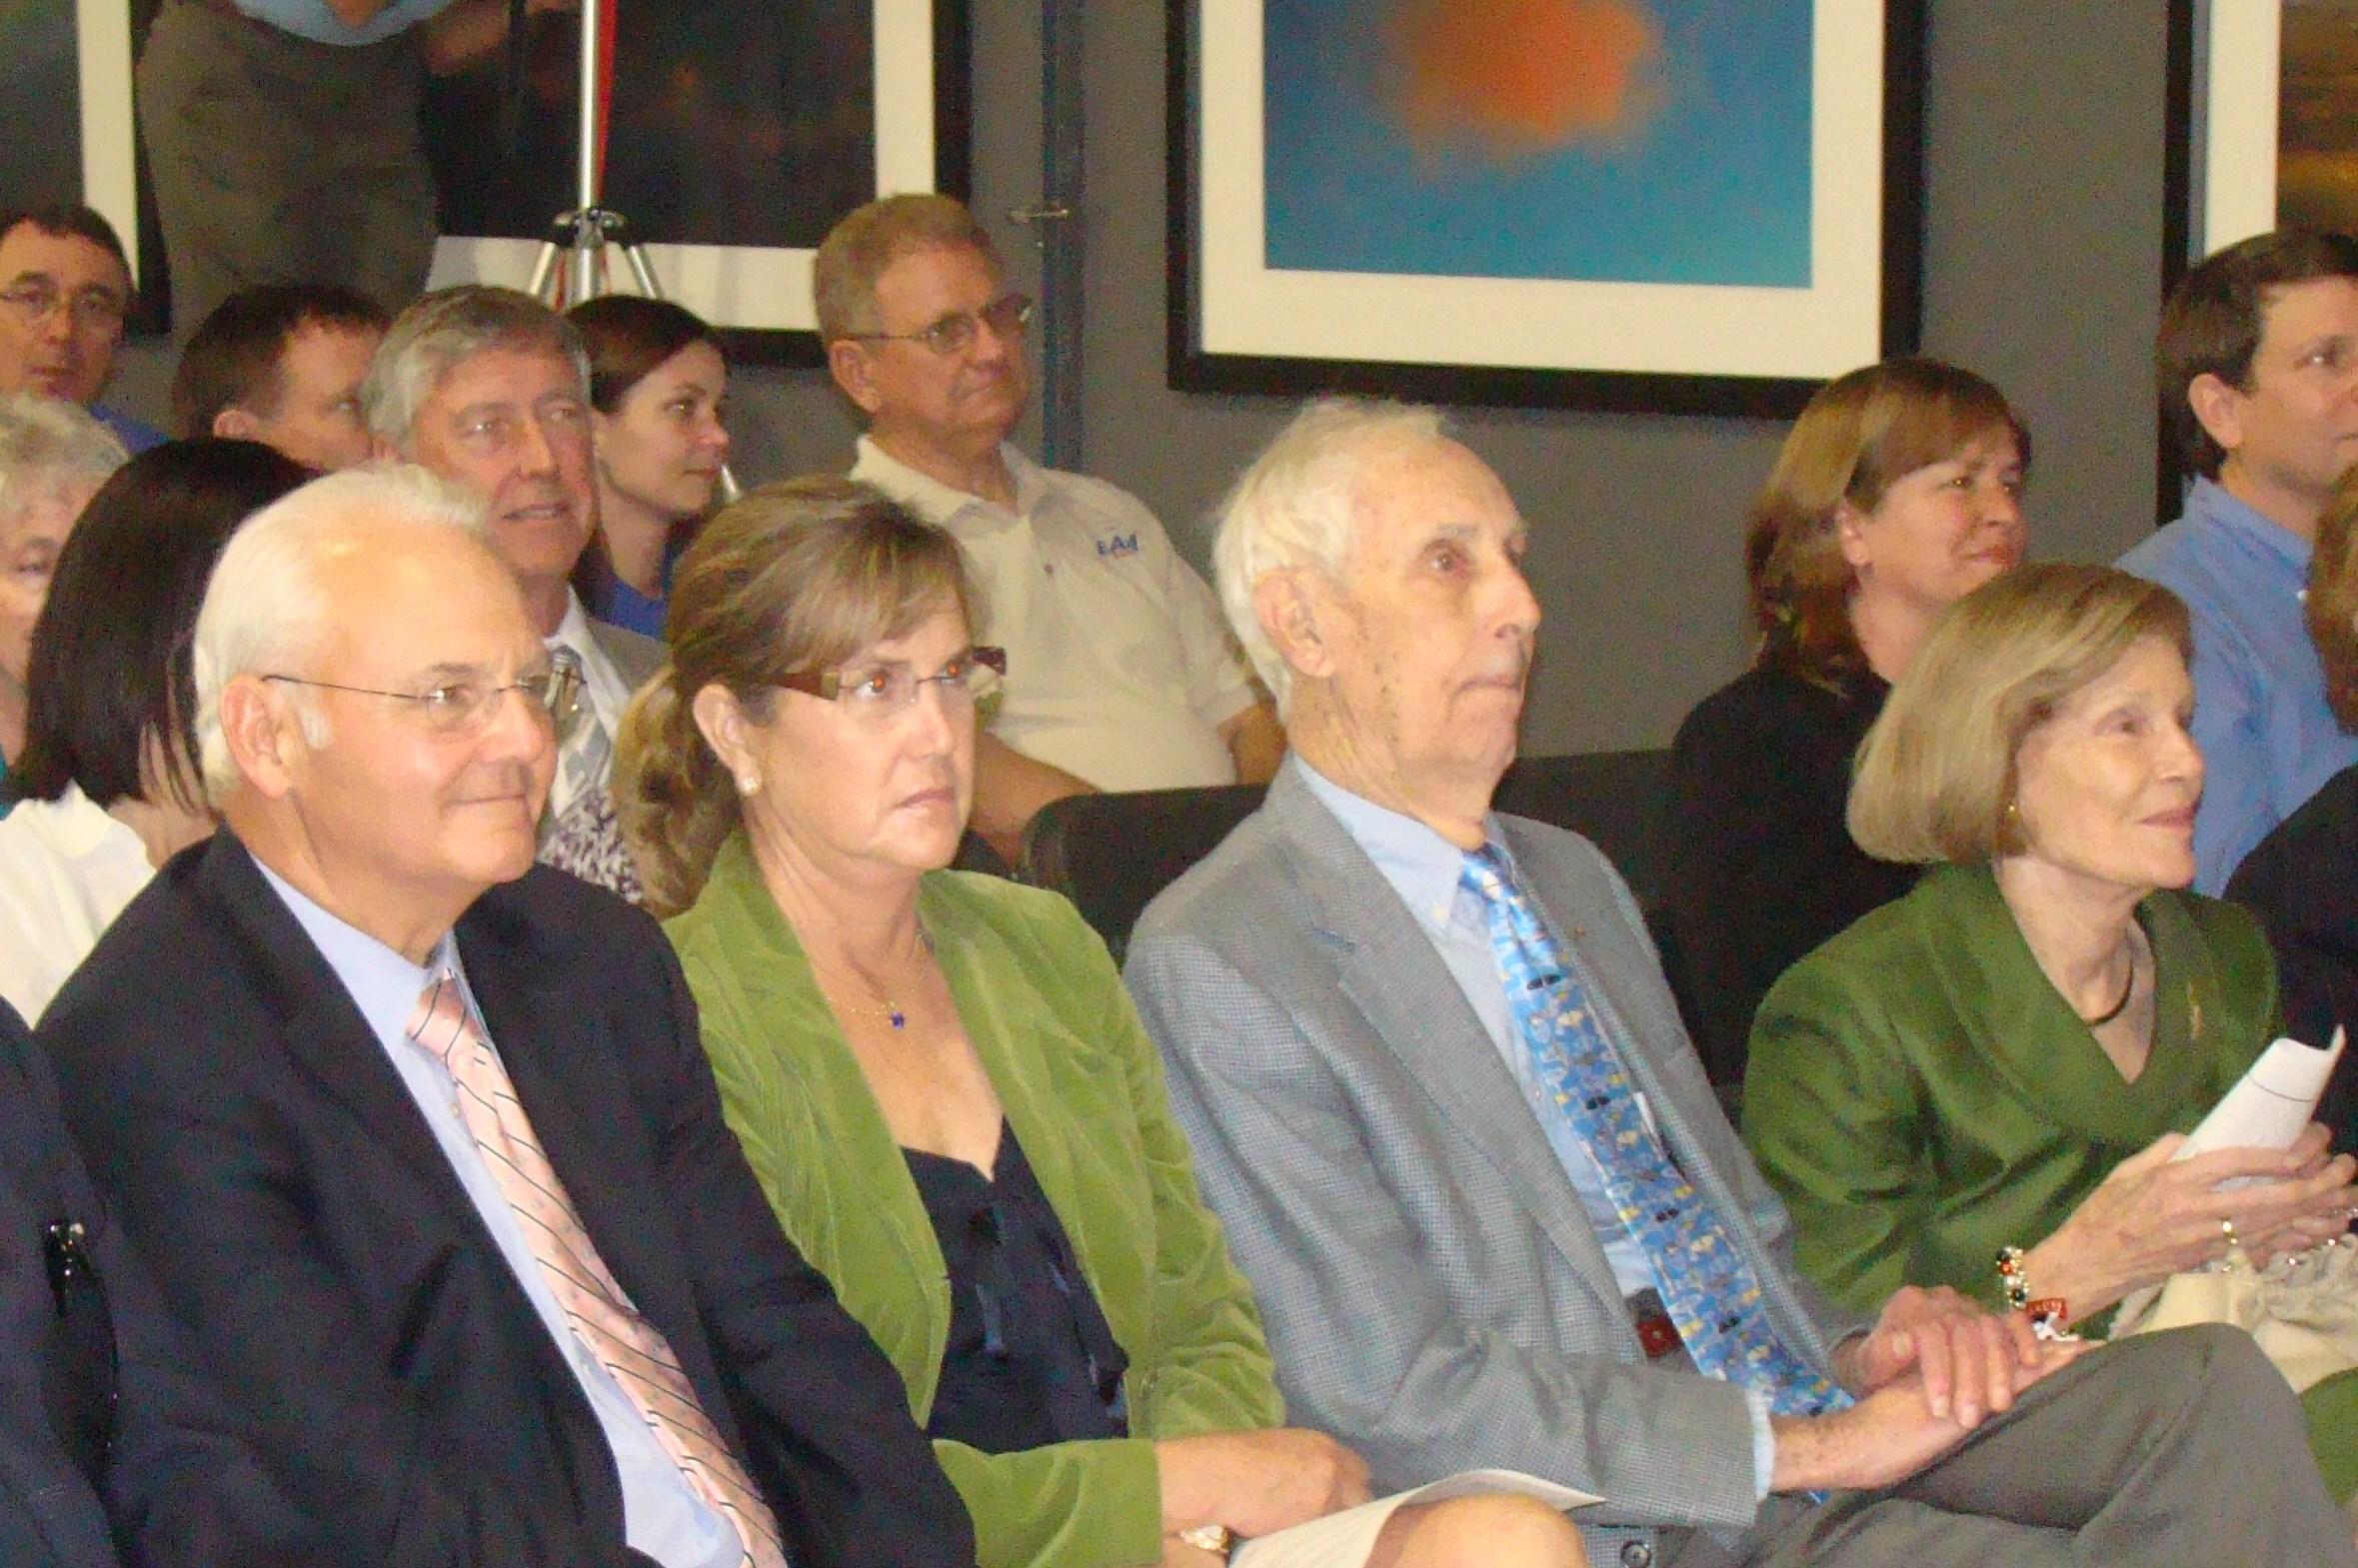 Bill Krusen & Family at Induction Ceremony - 2, 28 Jan '12.JPG